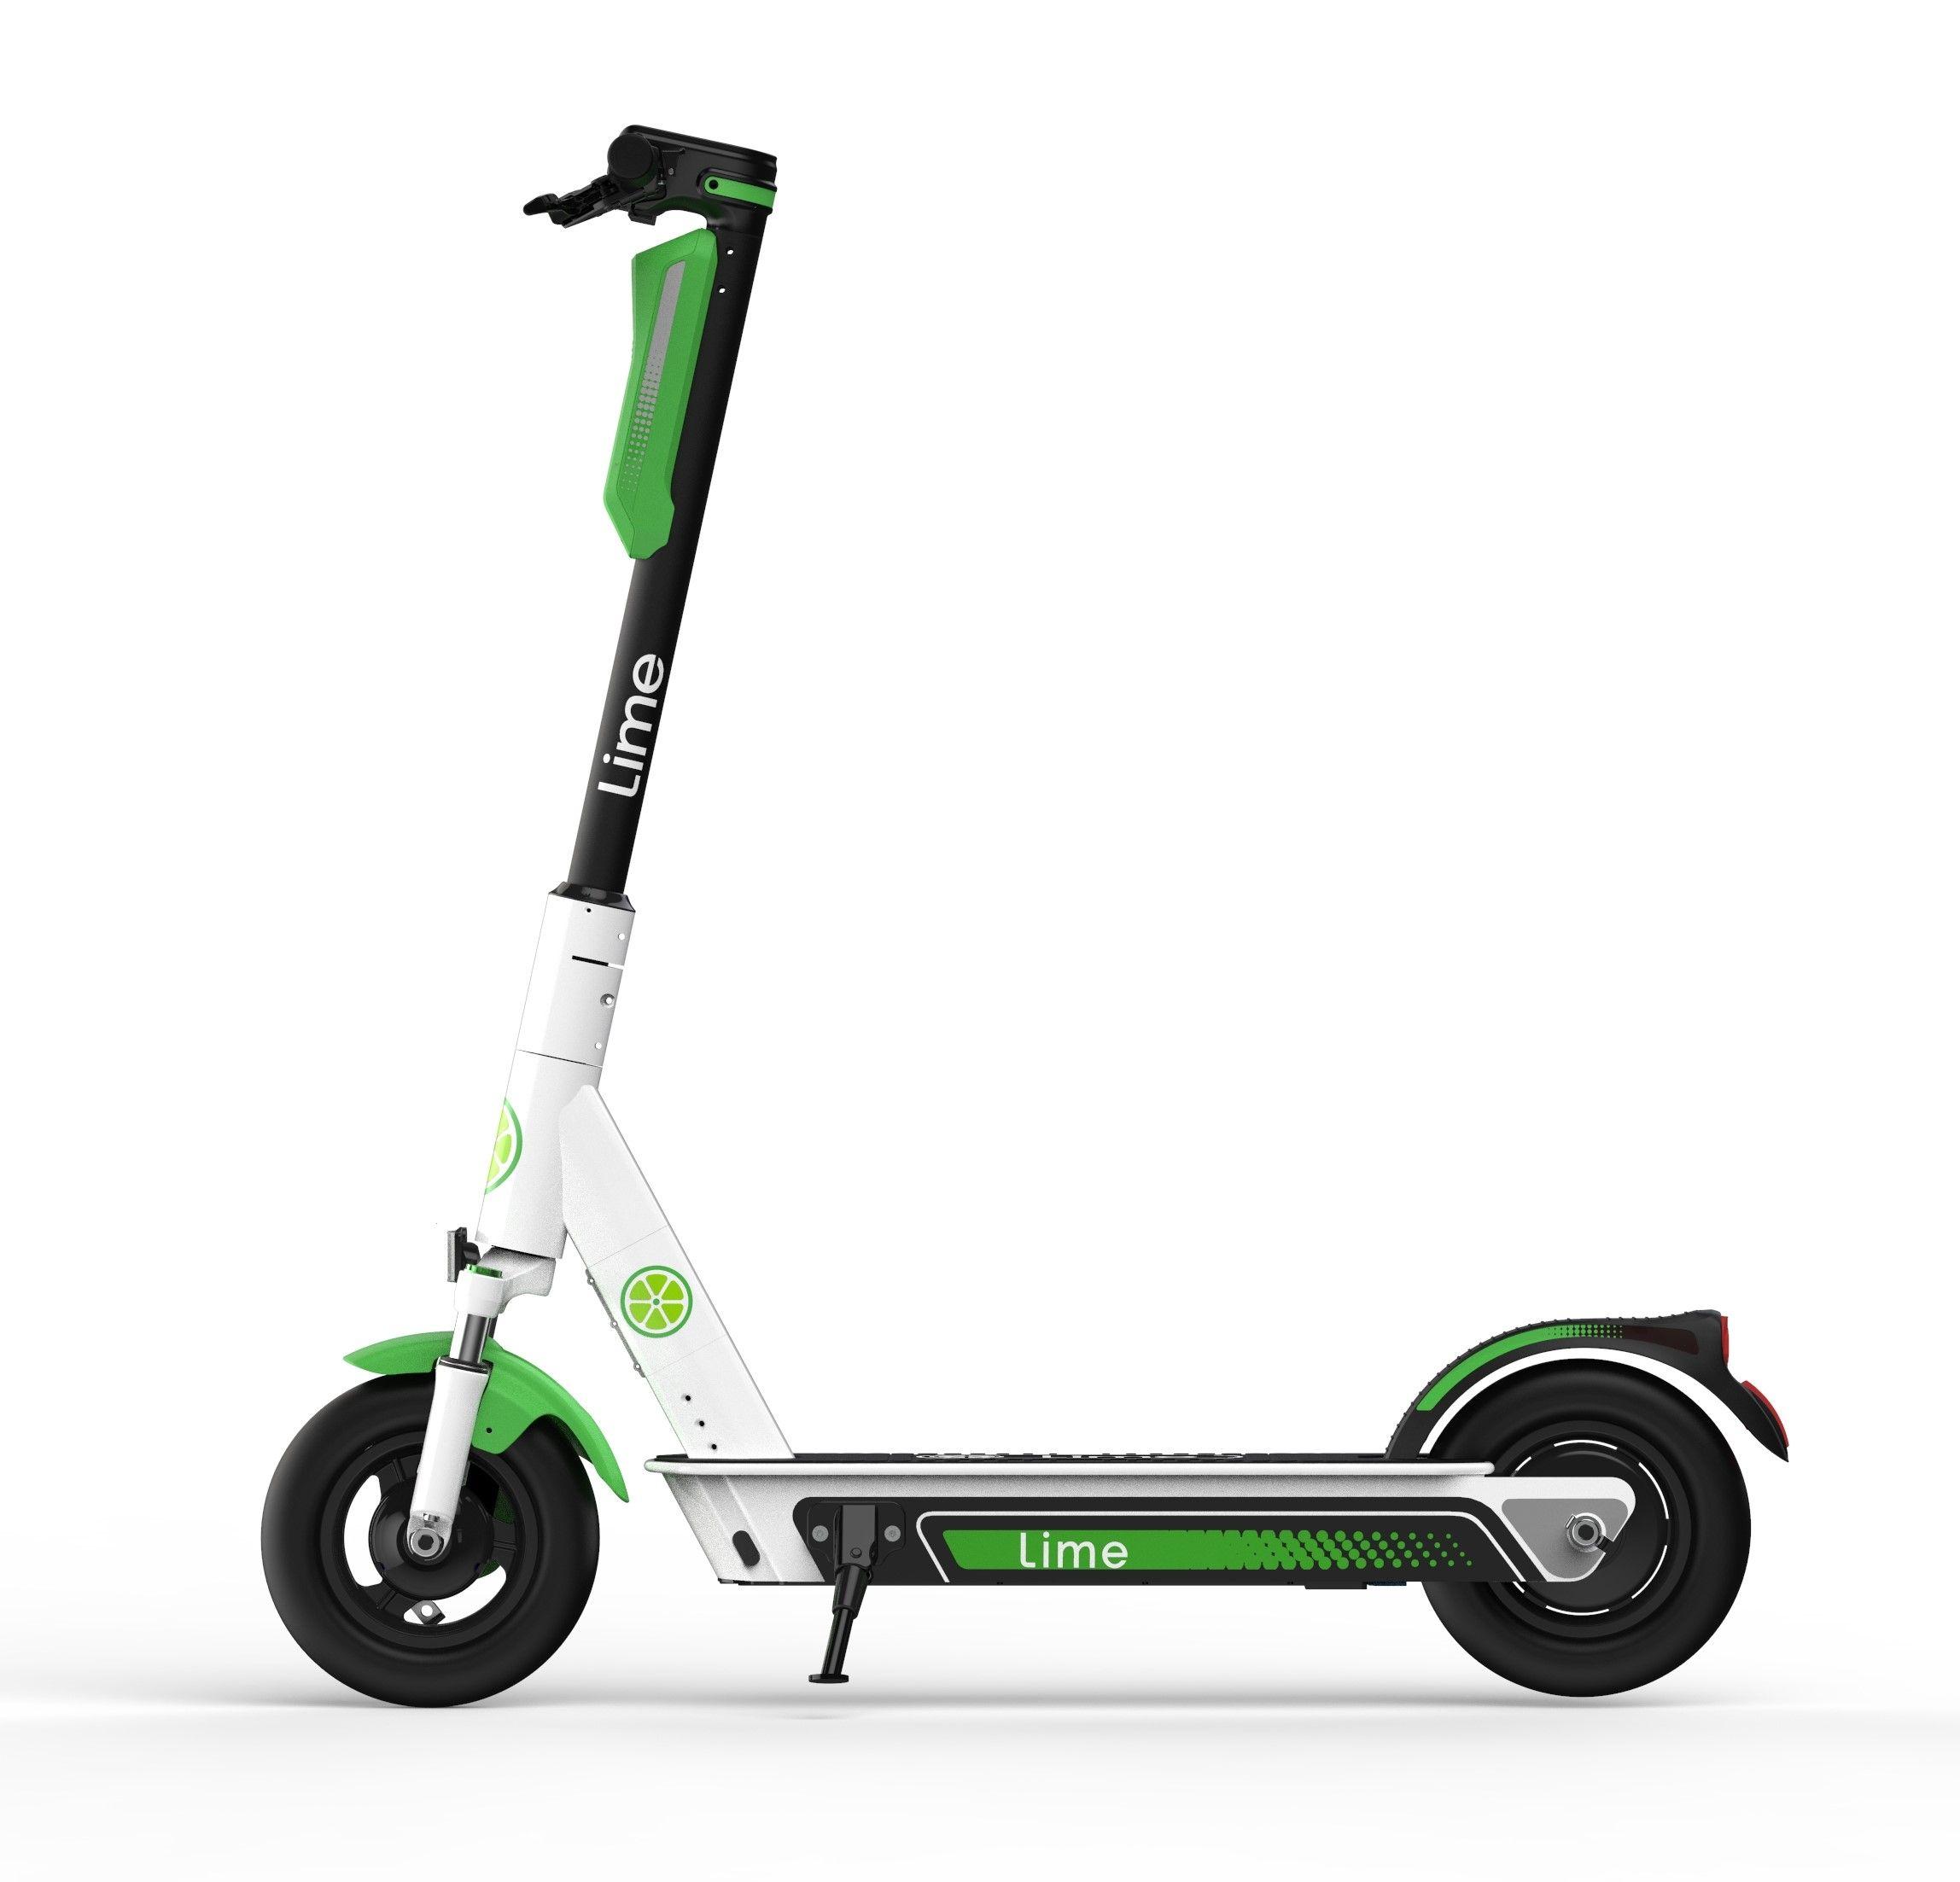 Lime E-Scooter 2 mal bis 30 Minuten kostenlos fahren. (FAKEGPS USA)